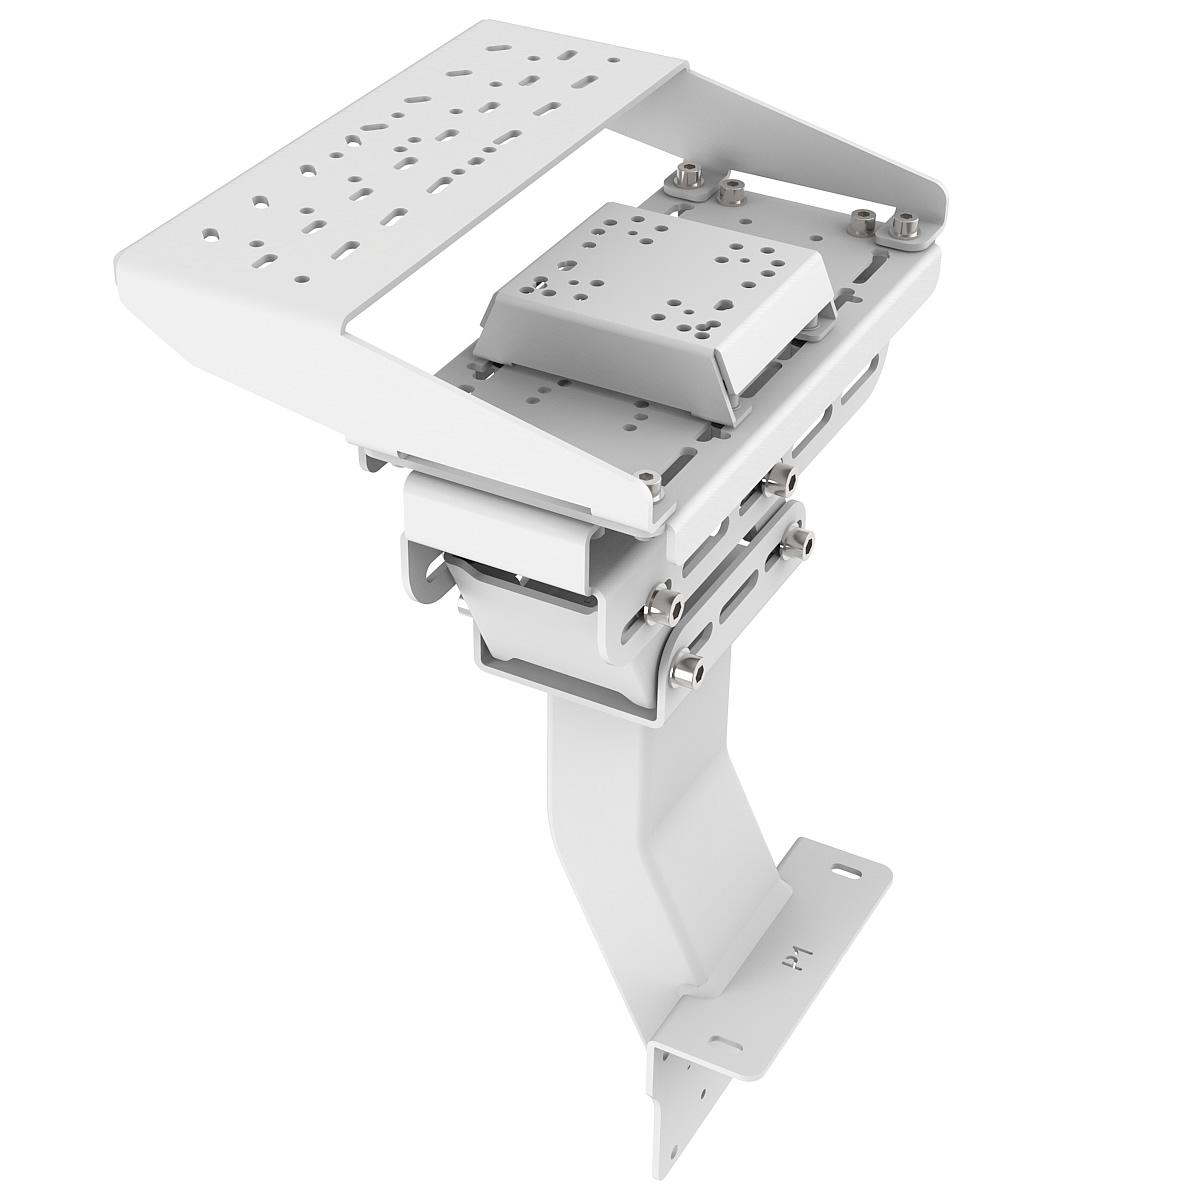 P1 Shifter / Handbrake Upgrade kit White